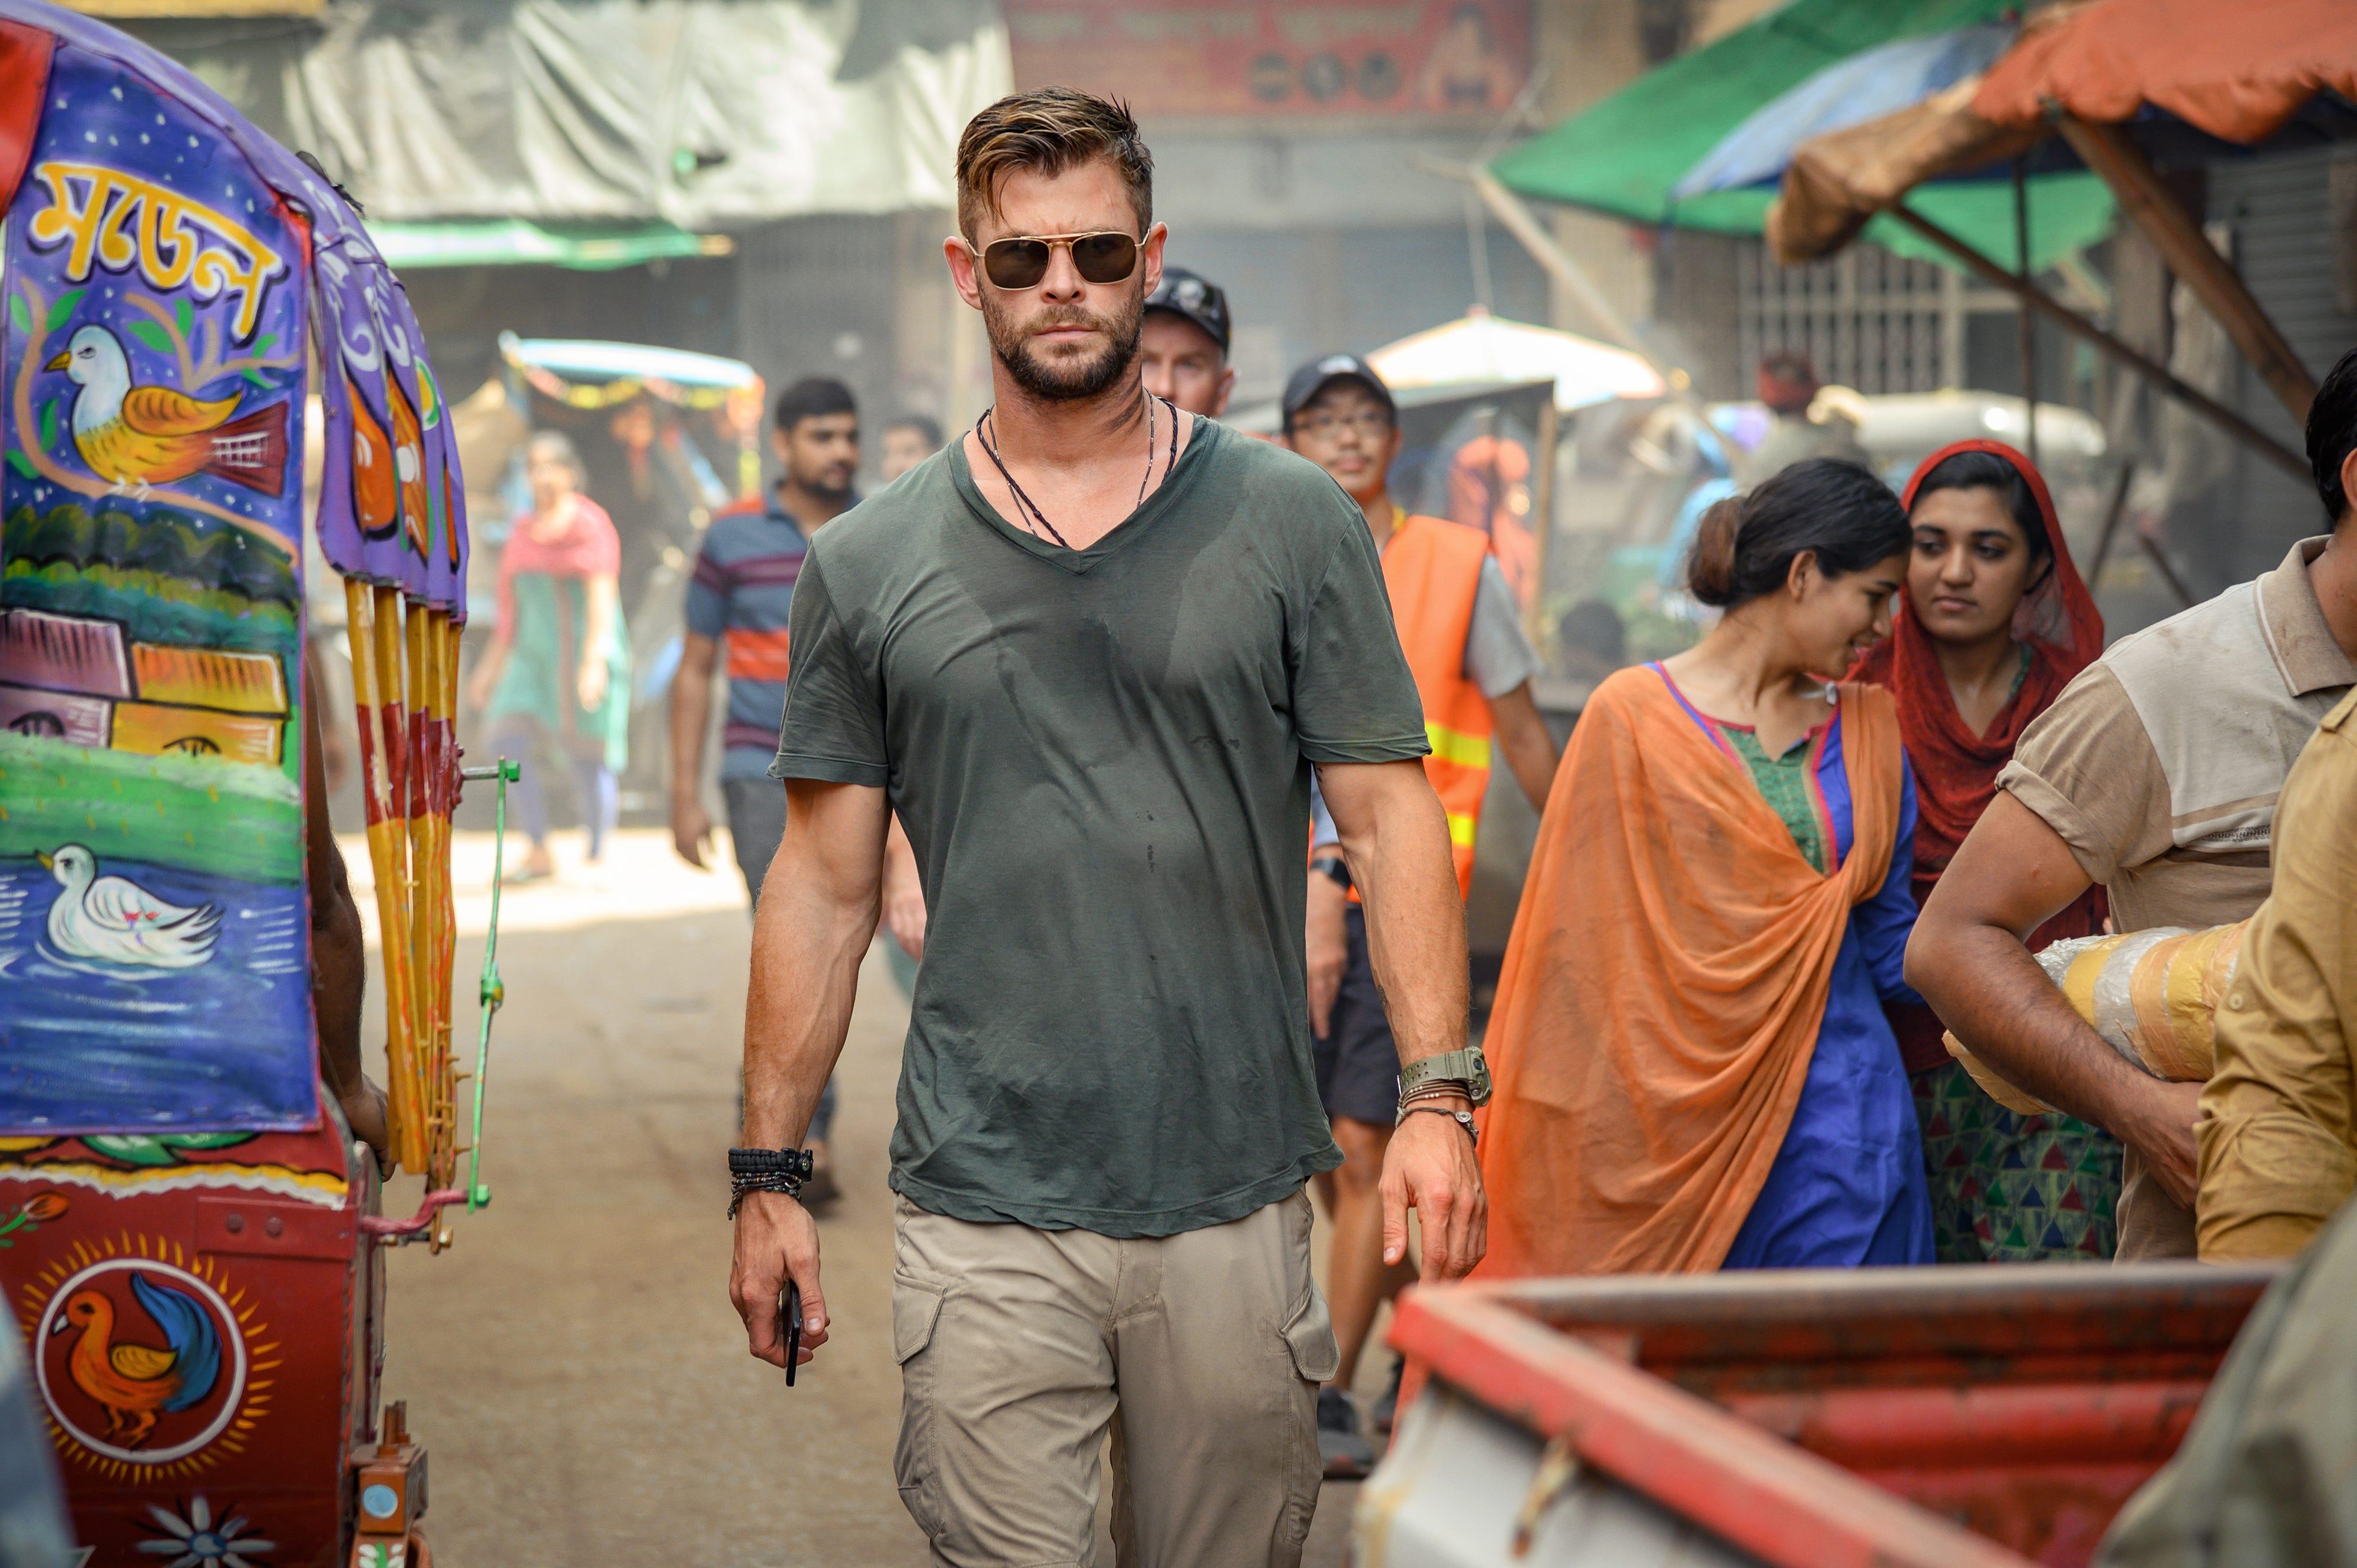 Chris Hemsworth: See exclusive photos of new Netflix film 'Extraction'